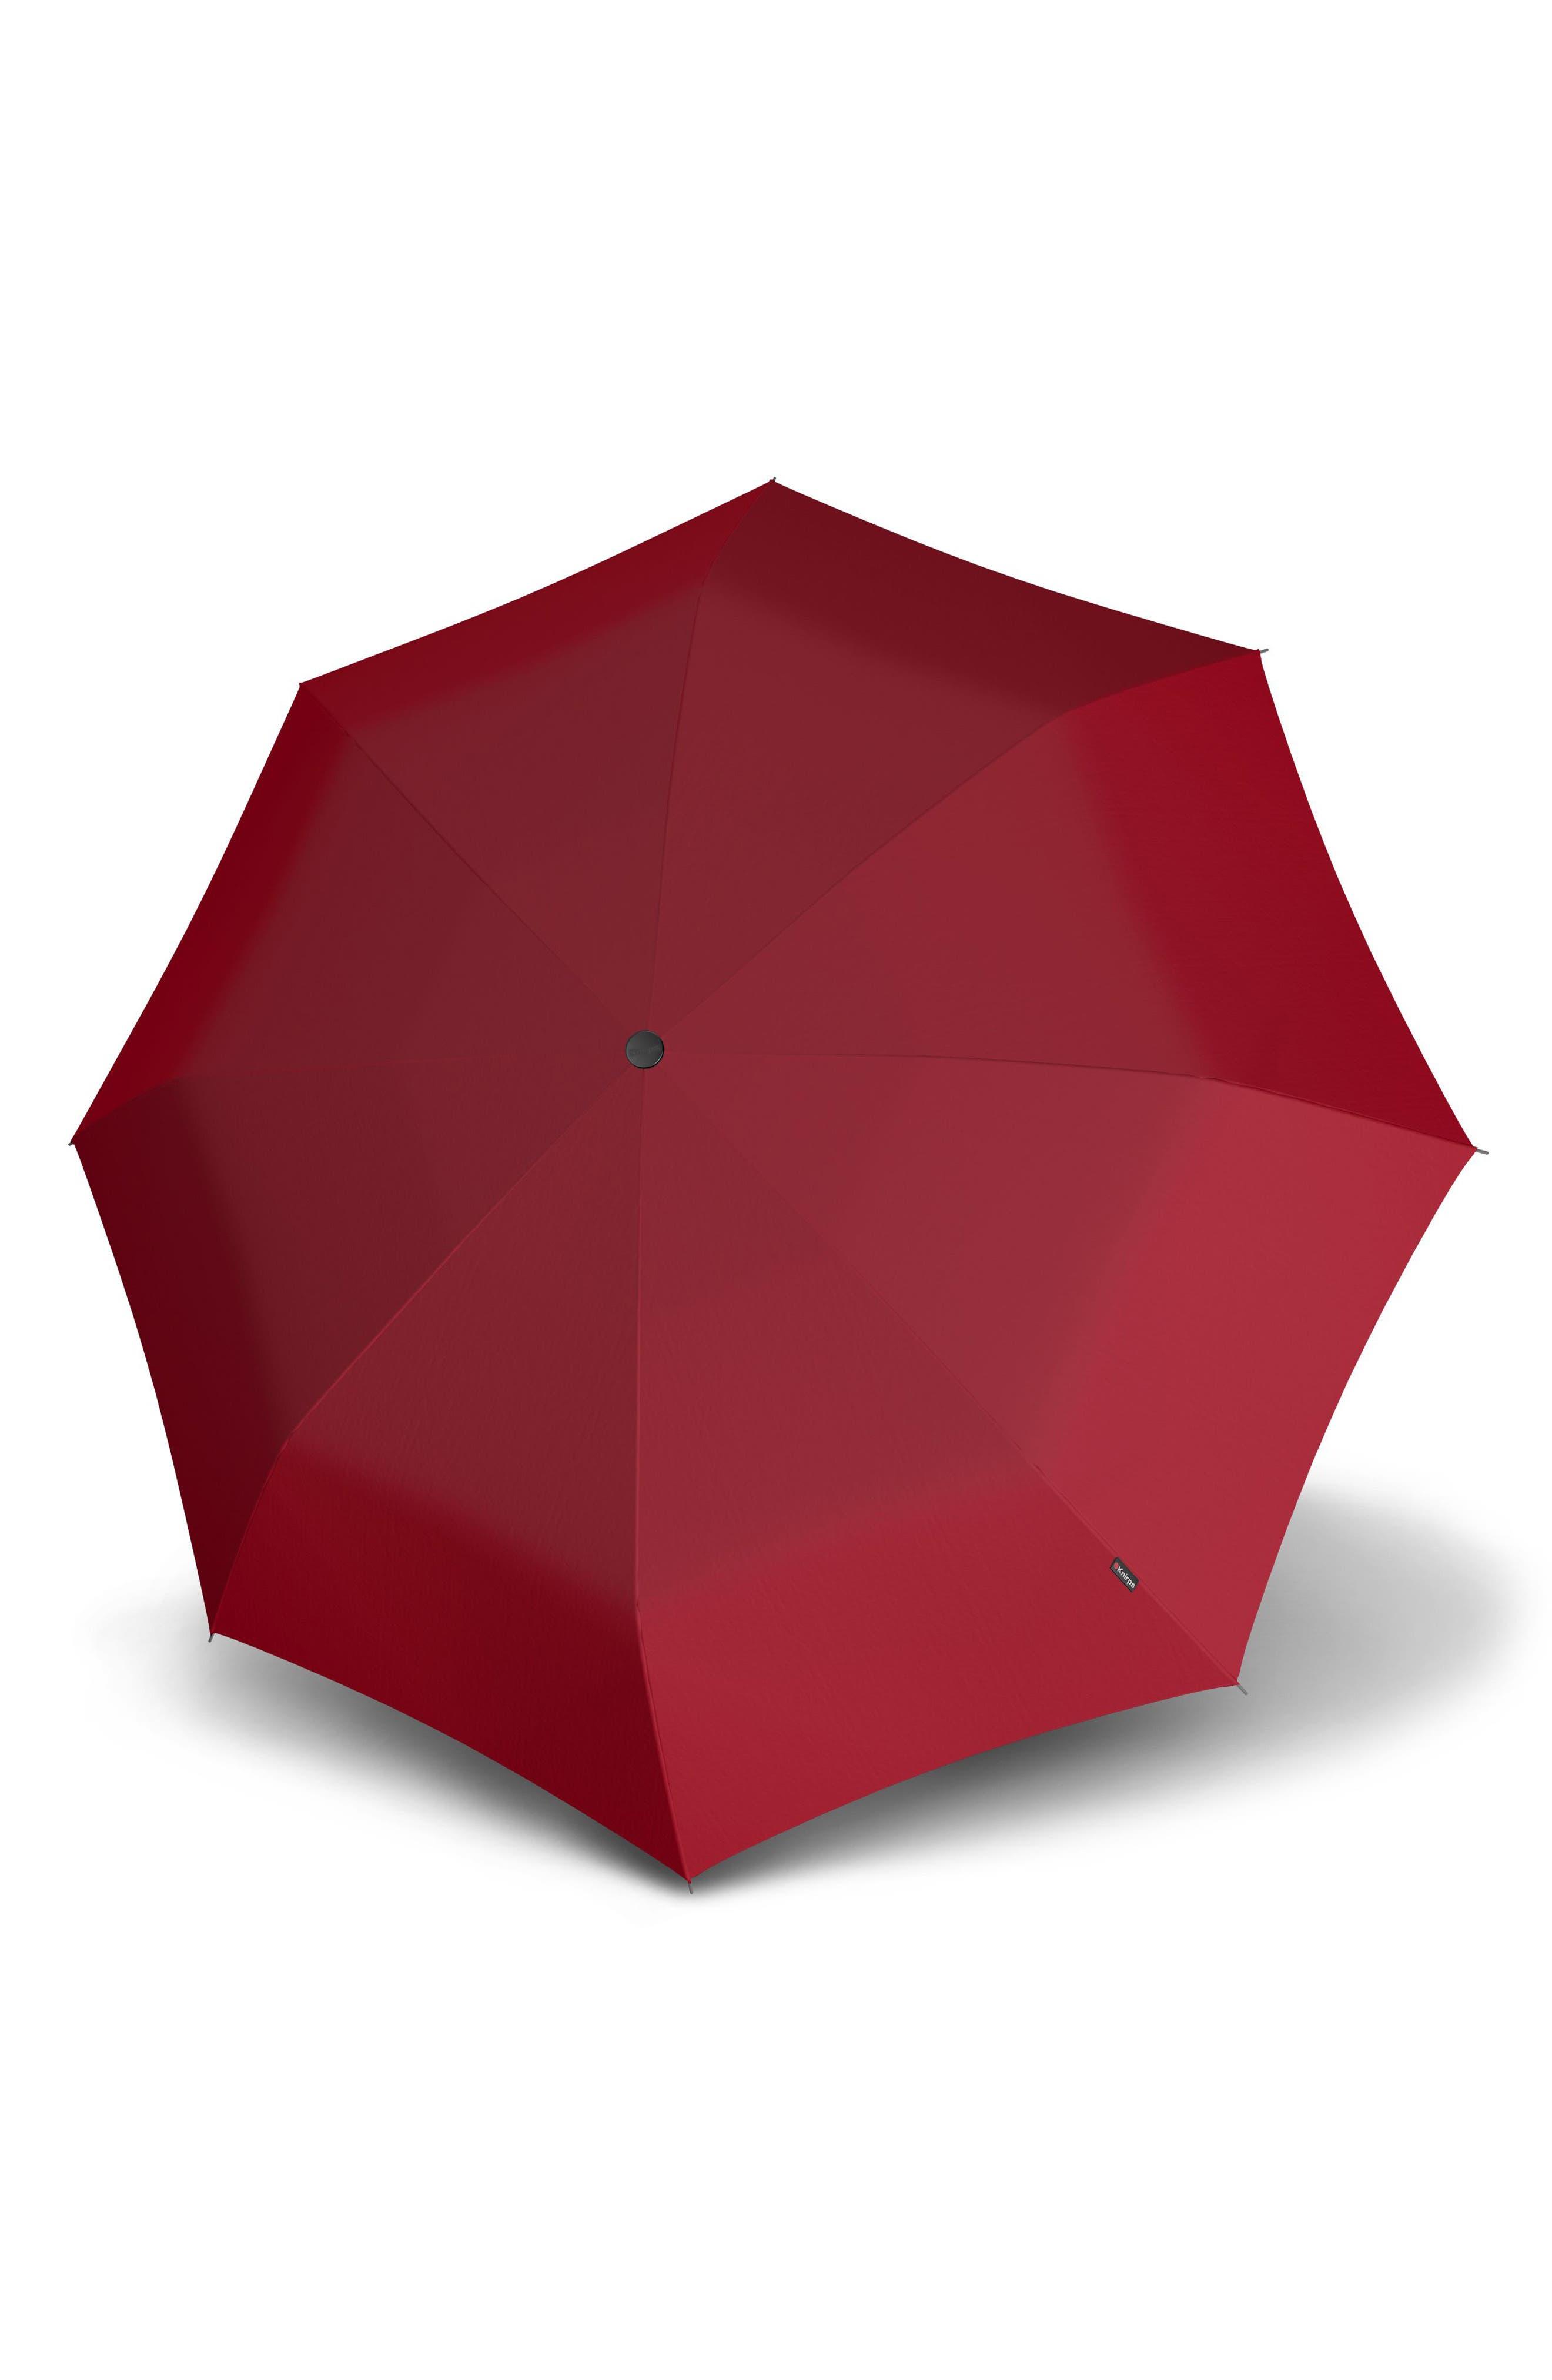 Compact Duomatic Umbrella,                             Main thumbnail 1, color,                             RED